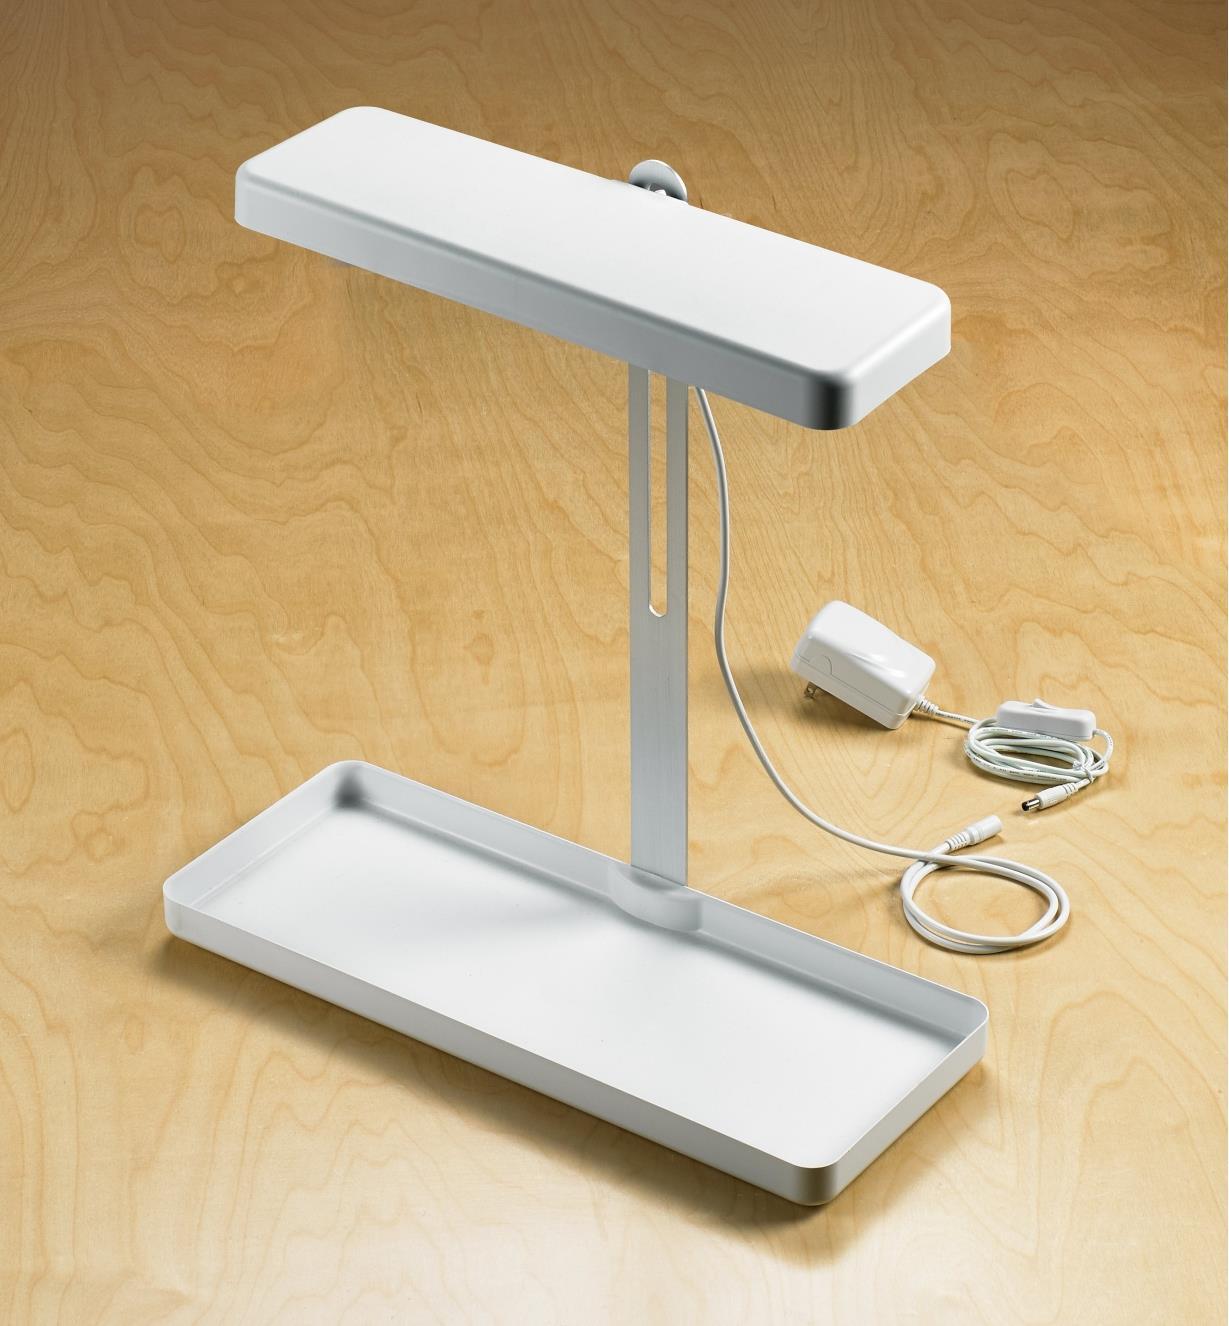 99W9205 - Tabletop LED Grow Light